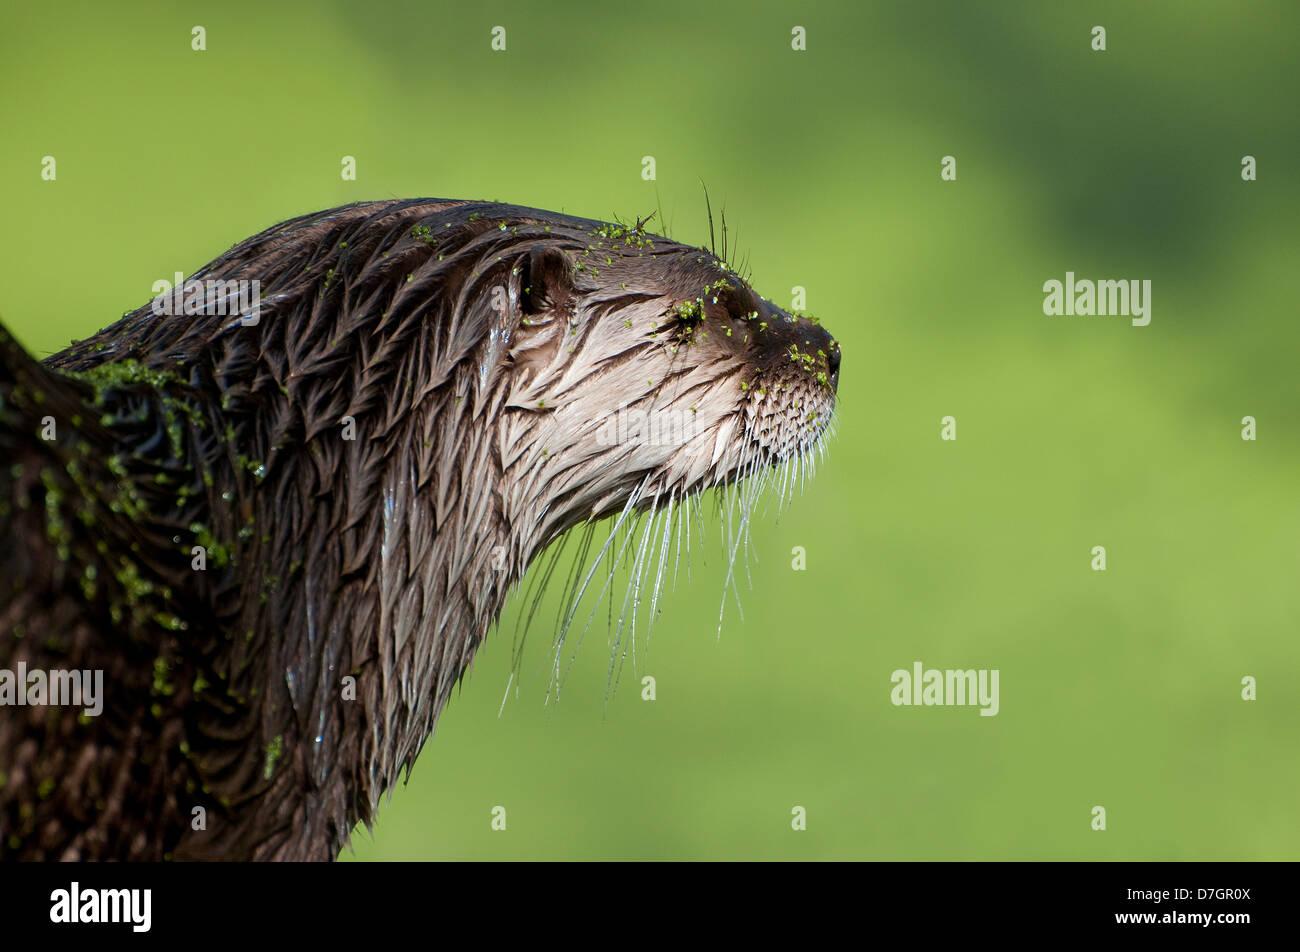 American River Otter auf grünem Hintergrund Stockbild